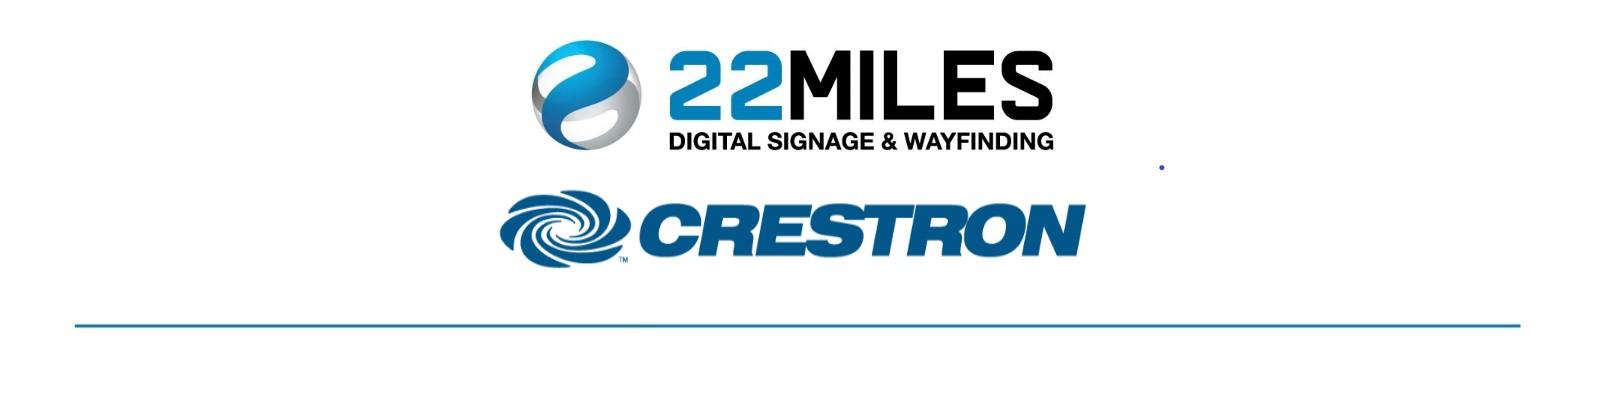 Crestron 22Miles